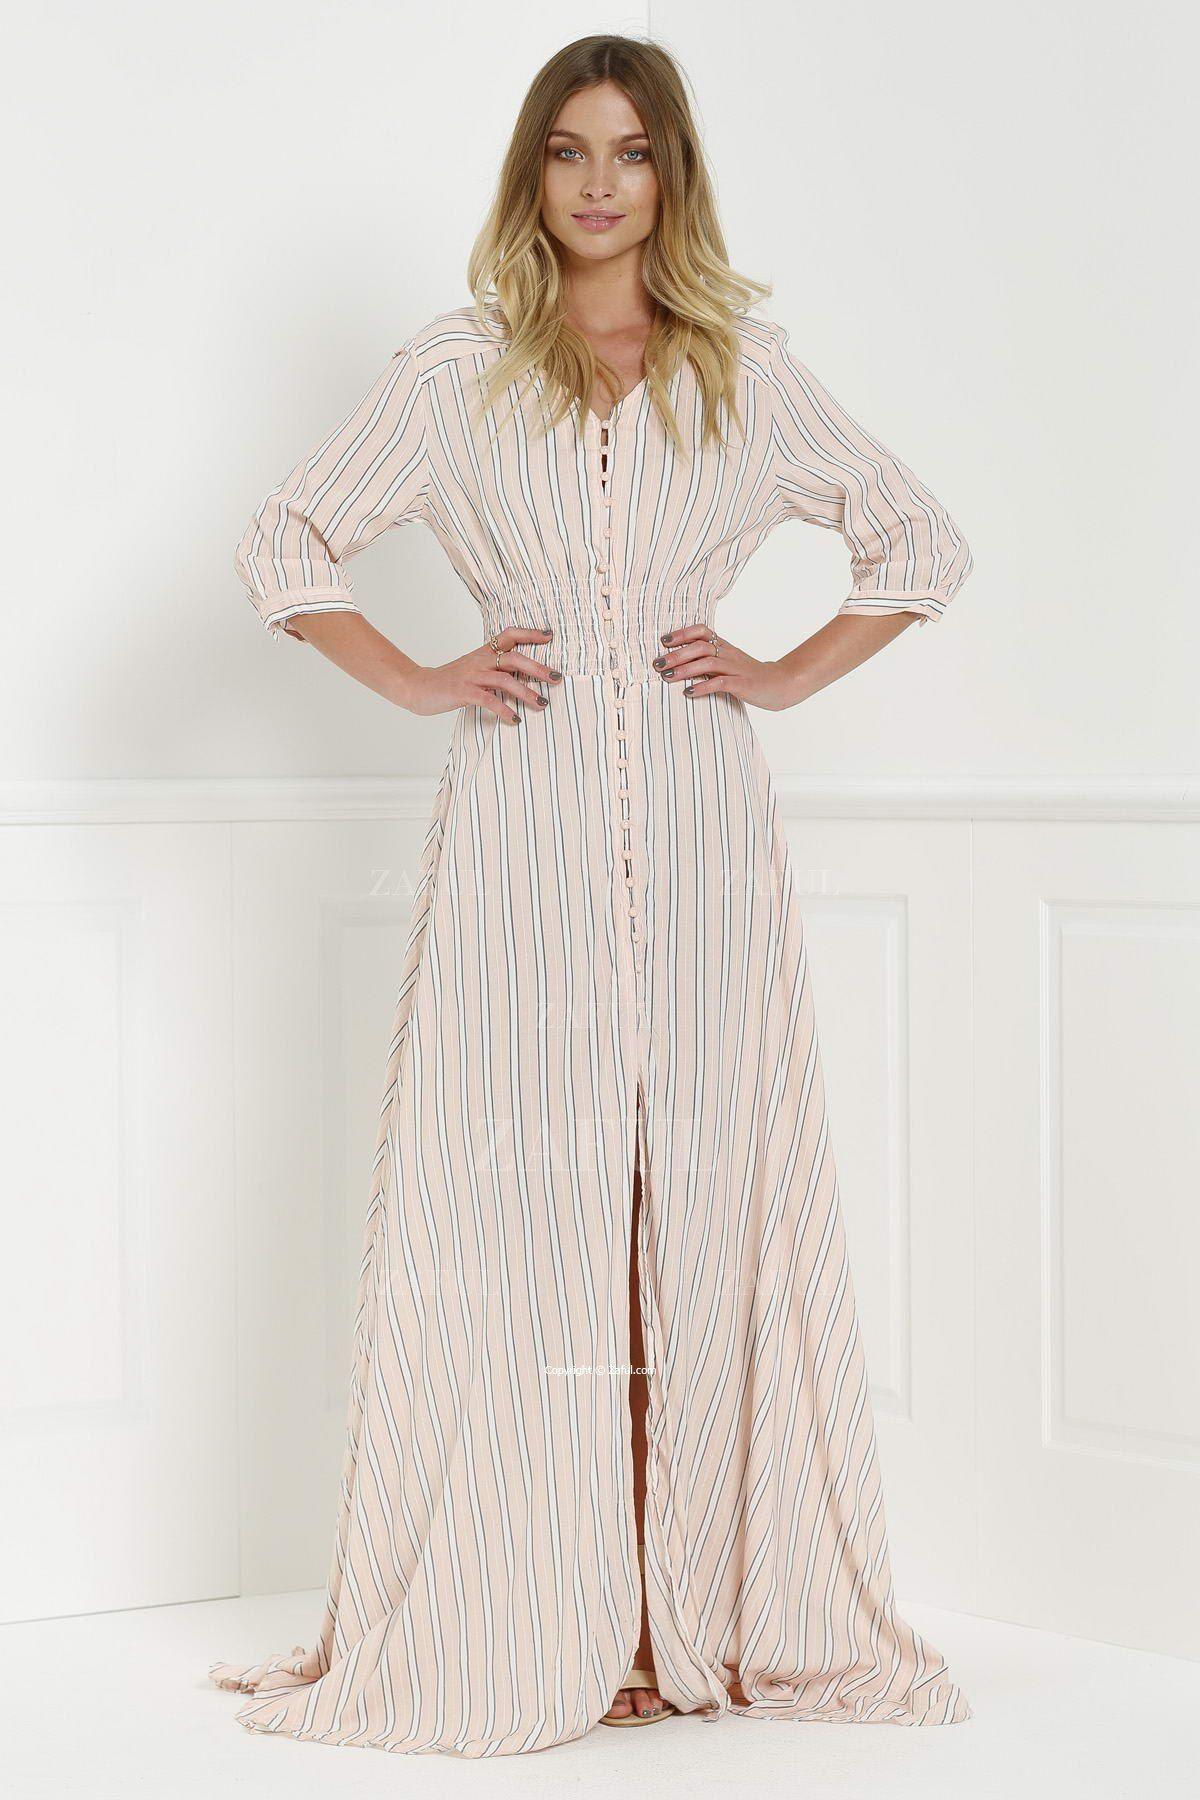 Button Front Stripe 3 4 Sleeve Maxi Dress Pink Maxi Dress With Sleeves Pink Maxi Dress Maxi Dress [ 1800 x 1200 Pixel ]